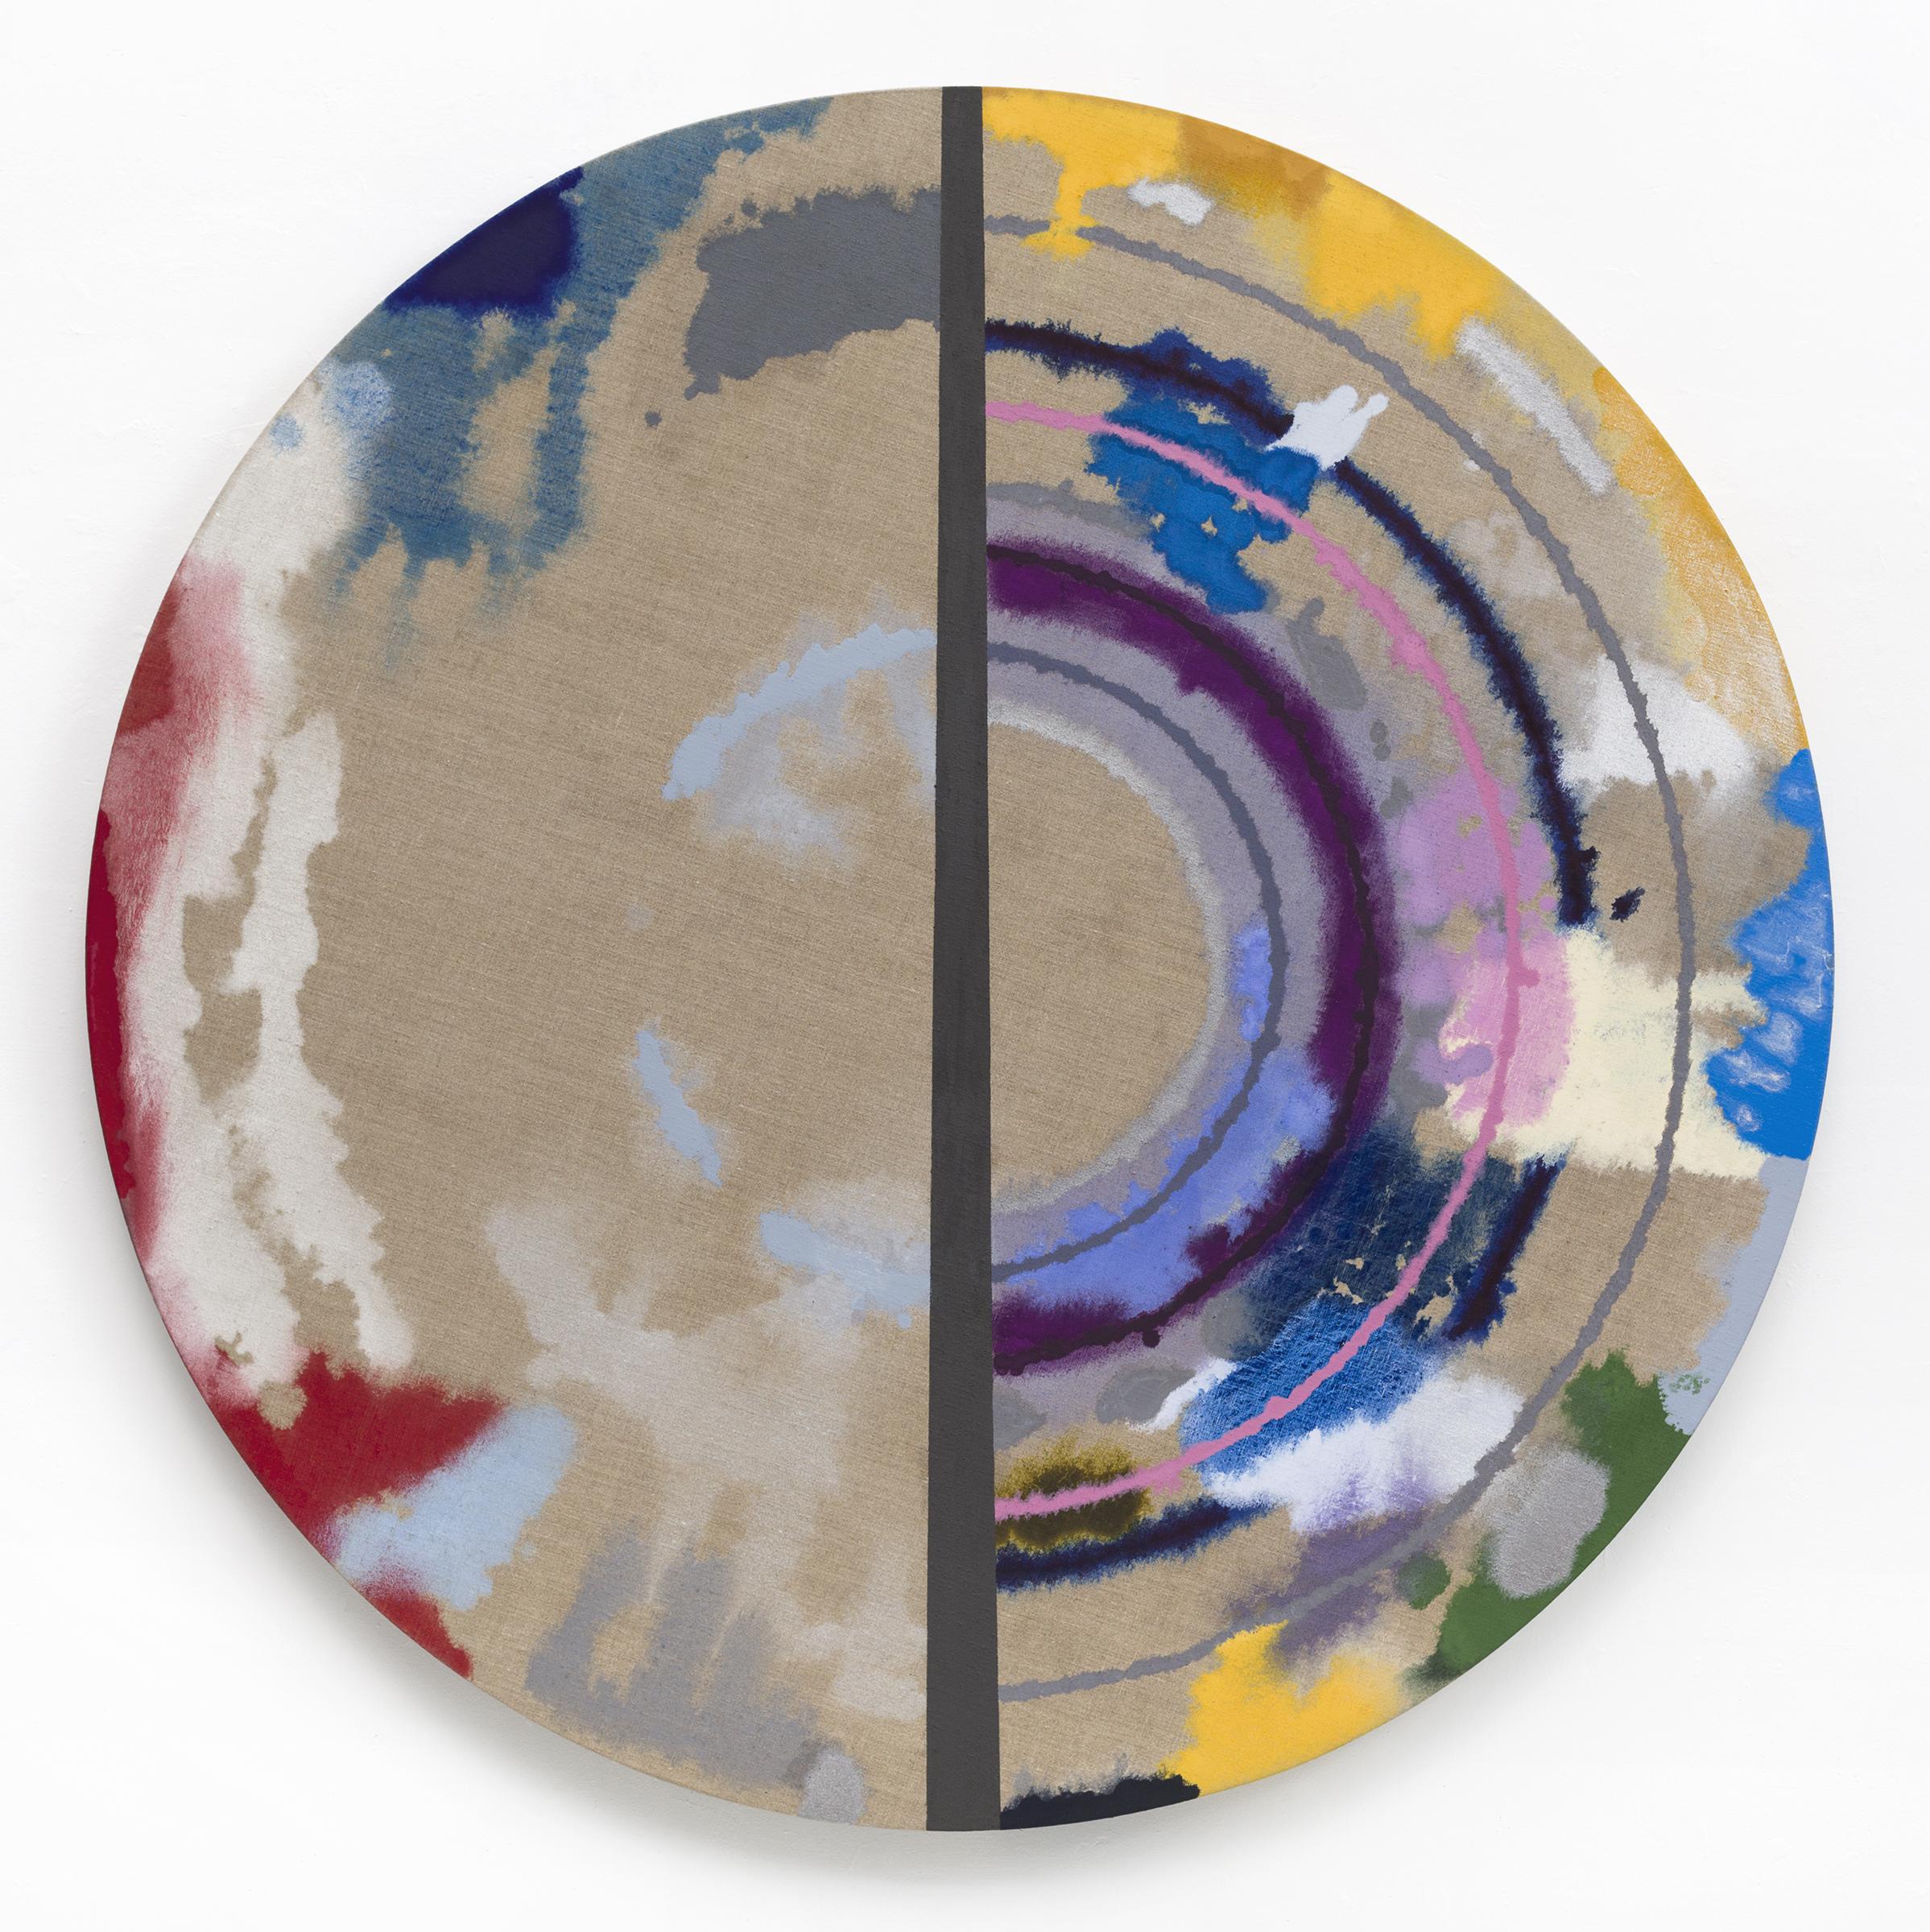 "PAMELA JORDEN   Cut Target , oil on linen, 52"" diameter, 2017"